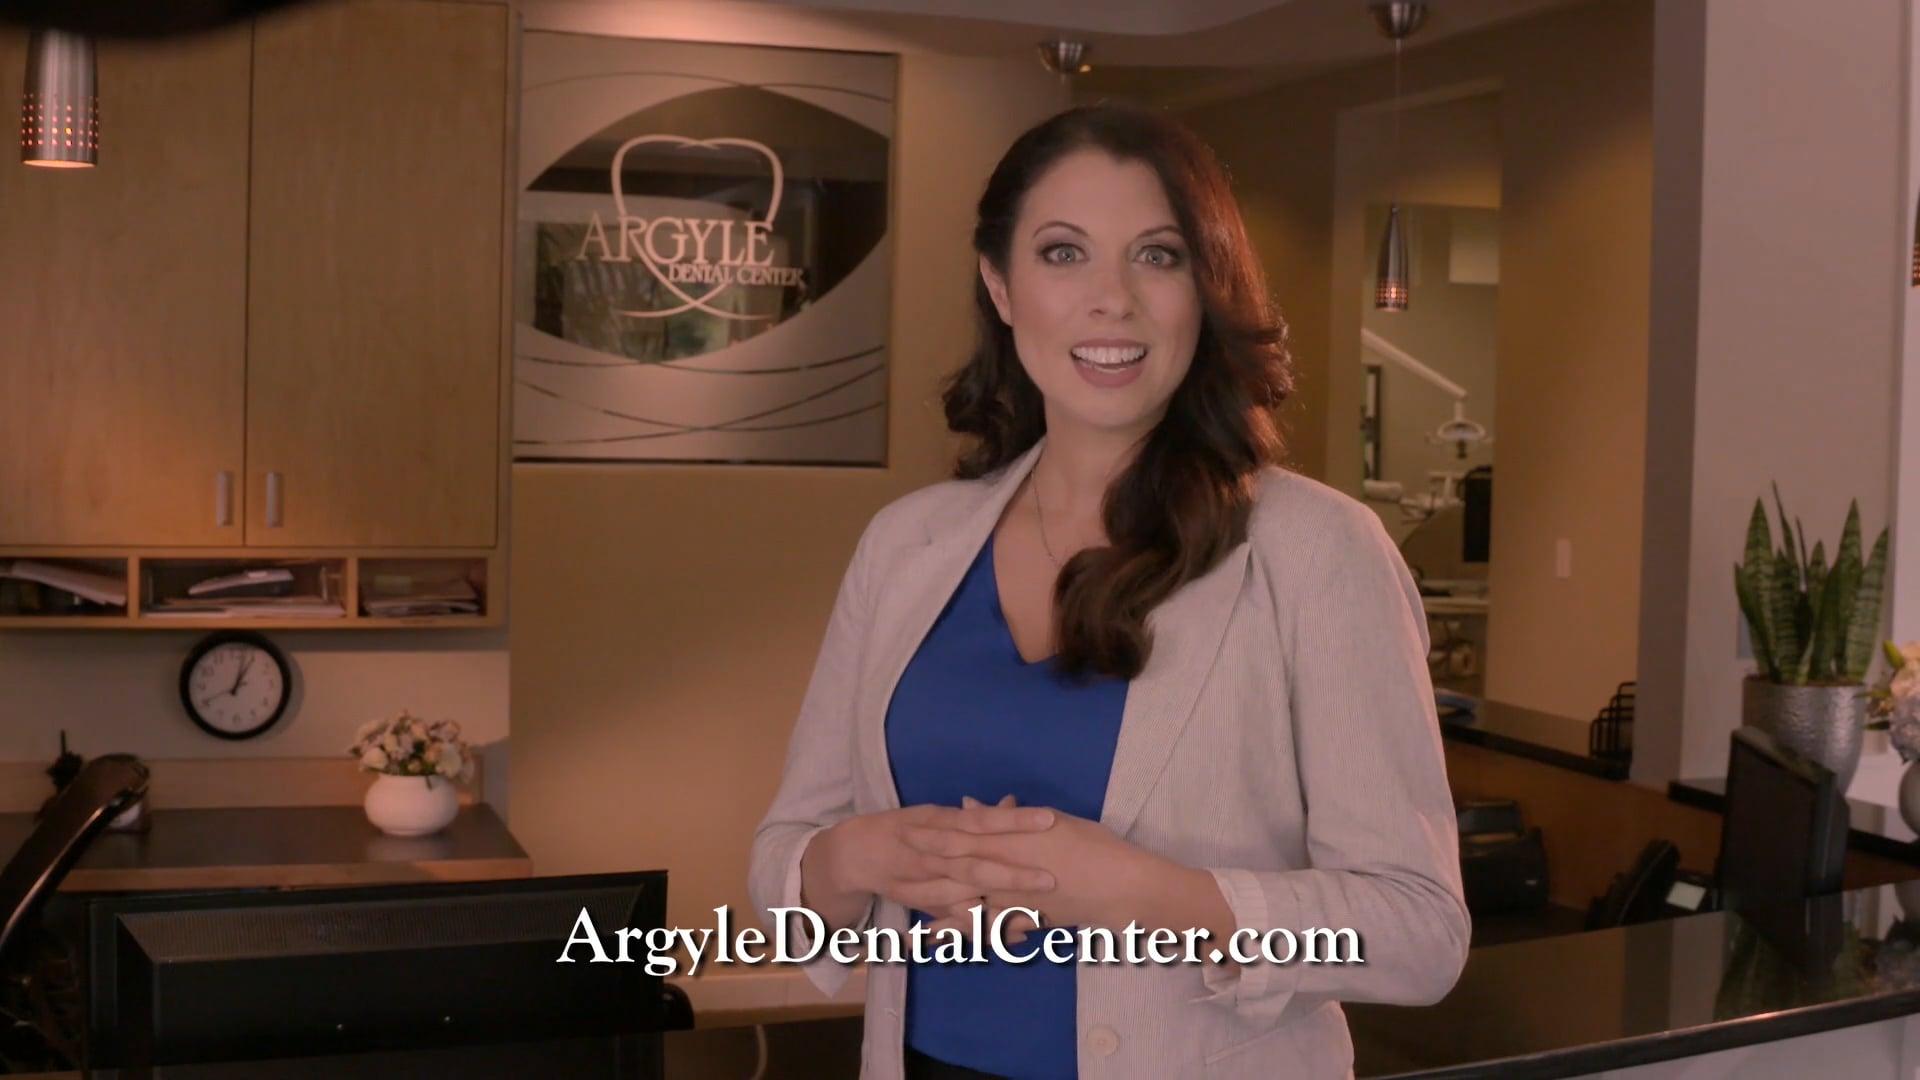 Argyle Dental Center - Dentures